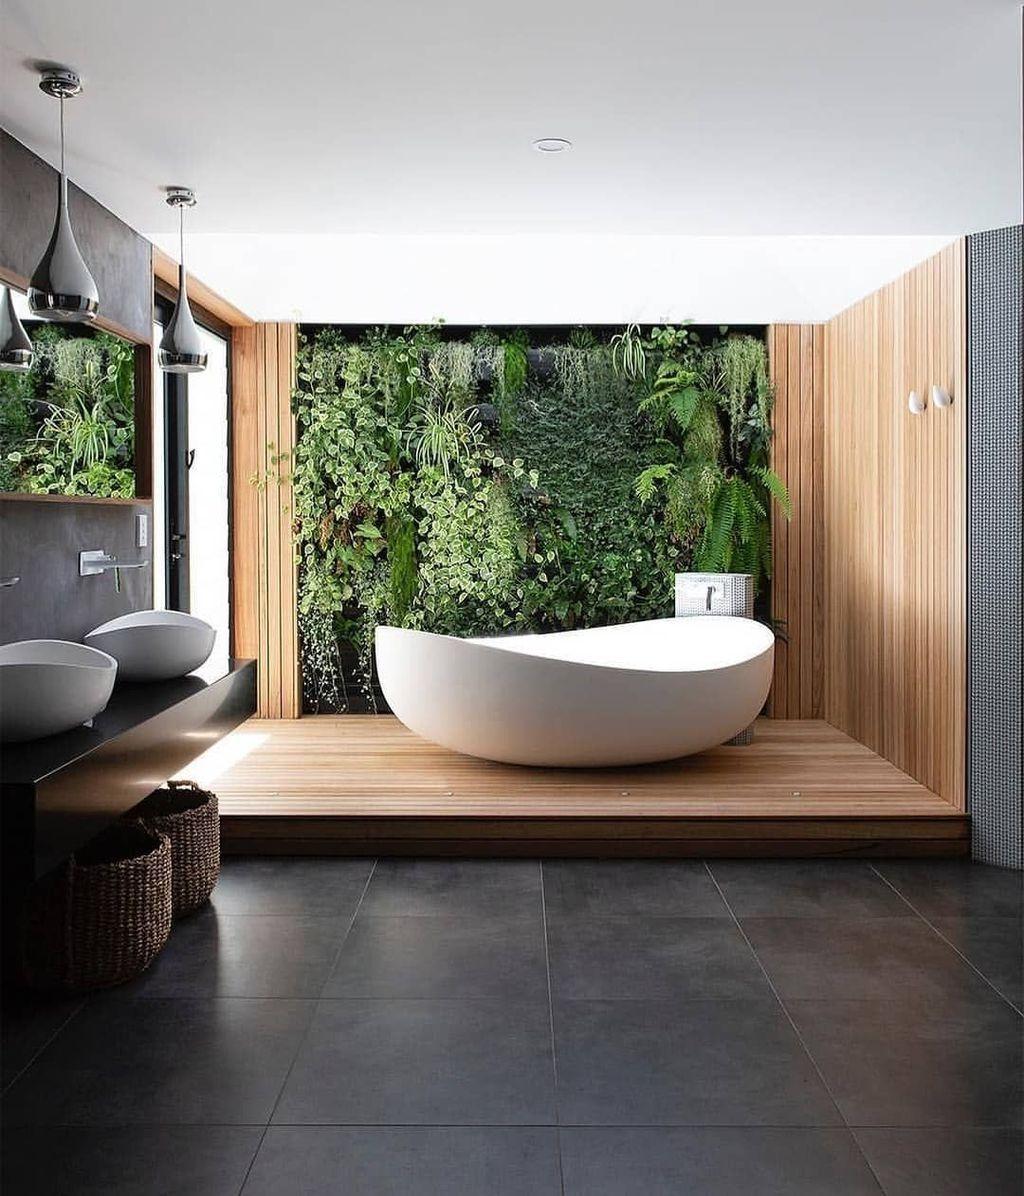 Best Master Bathroom Decor Ideas To Try Asap13 Jpg 1 024 1 196 Pixel Master Bathroom Decor Fall Interior Decor House Design